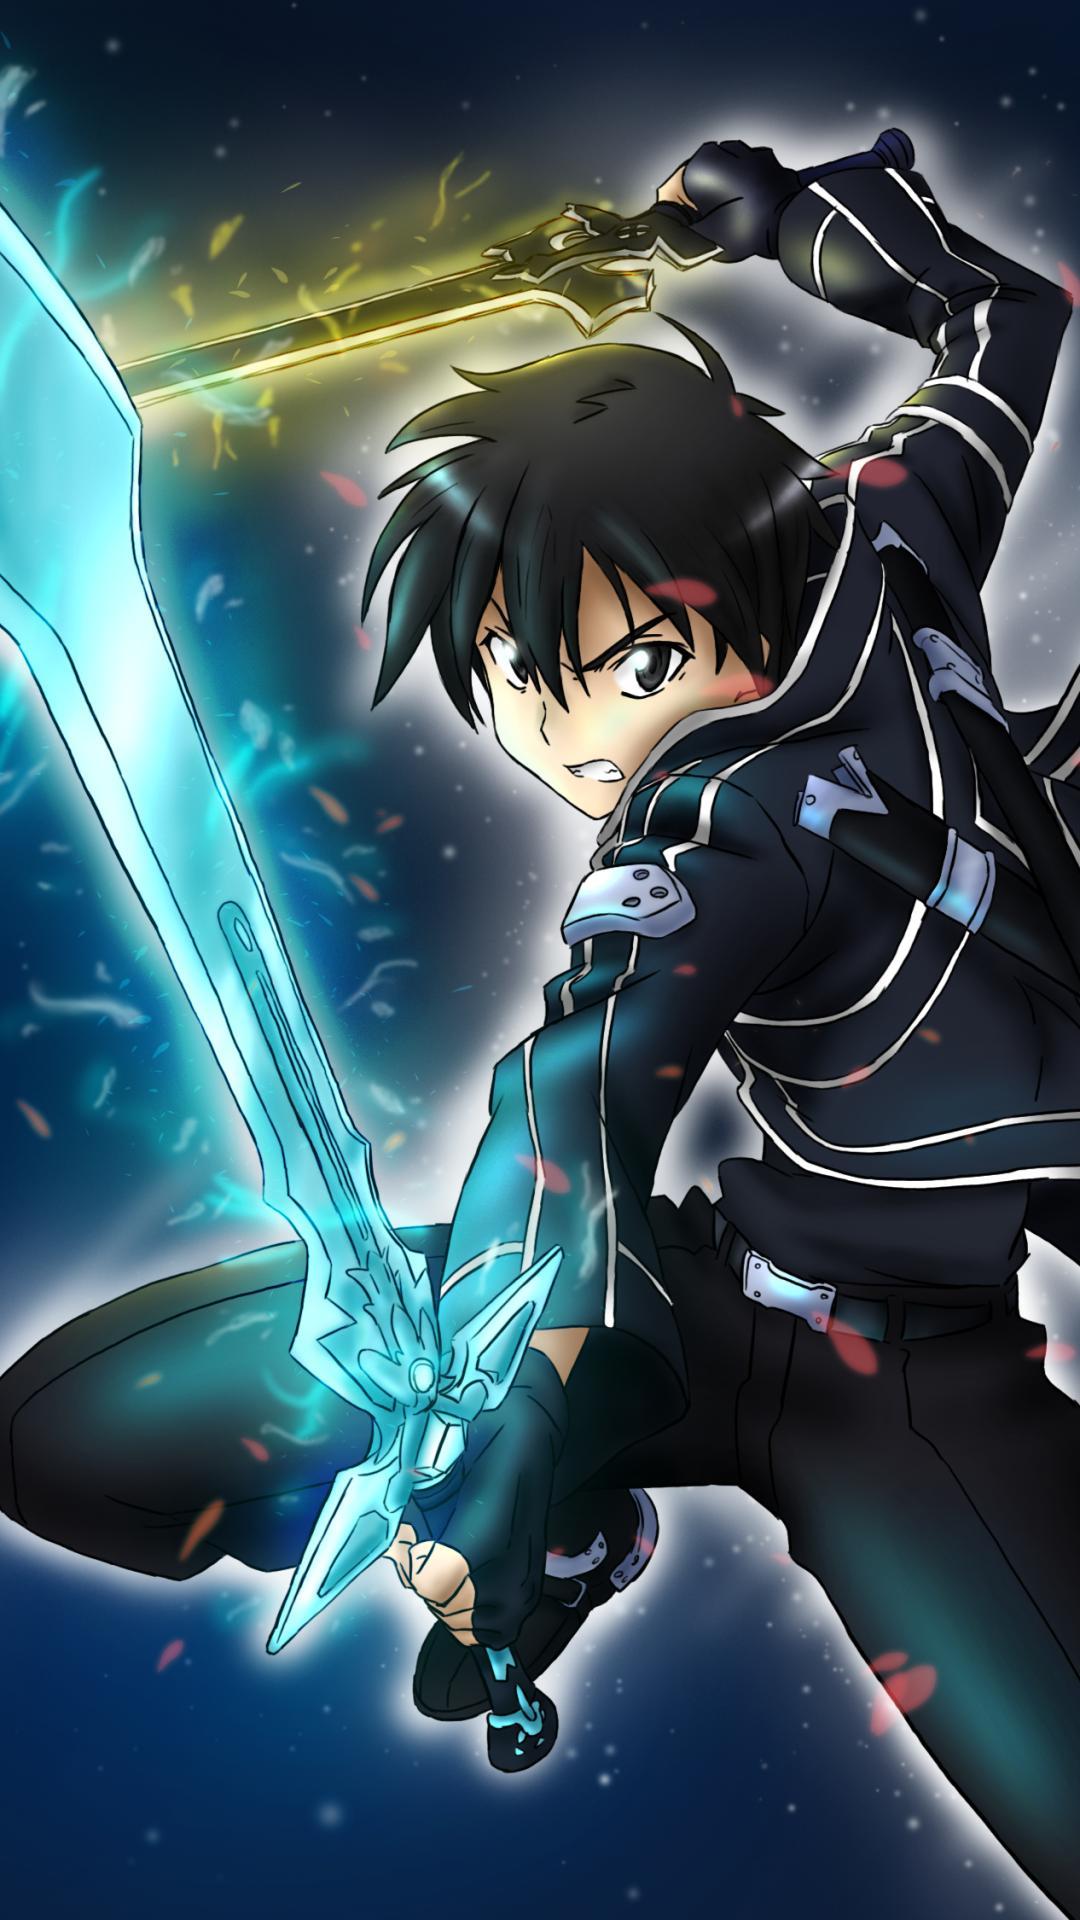 Sword Art Online Kirito And Asuna Wallpaper для андроид